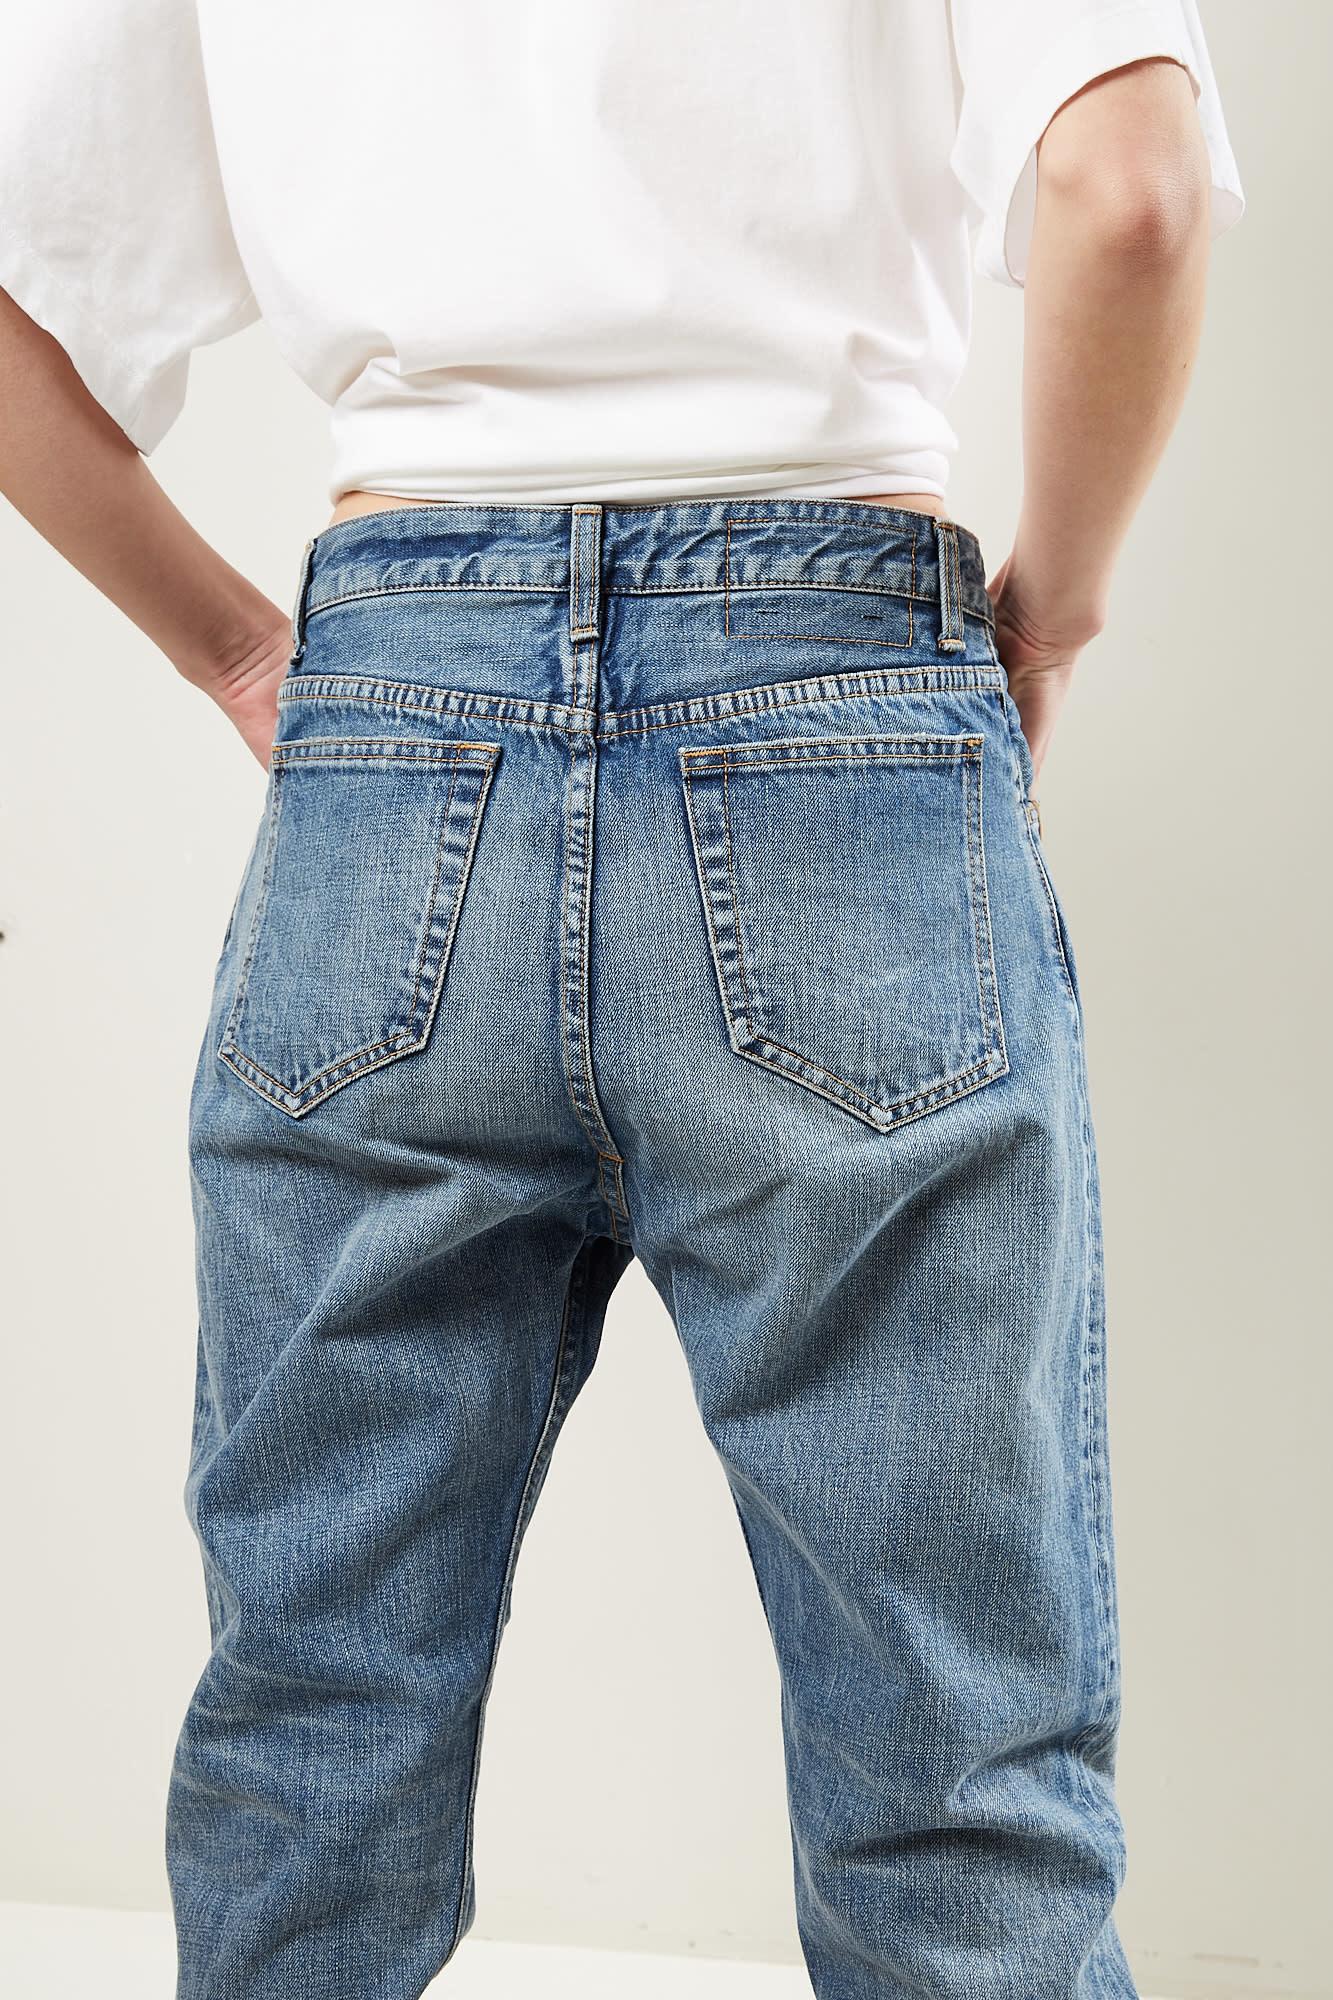 C.C.01 5 pocket jeans